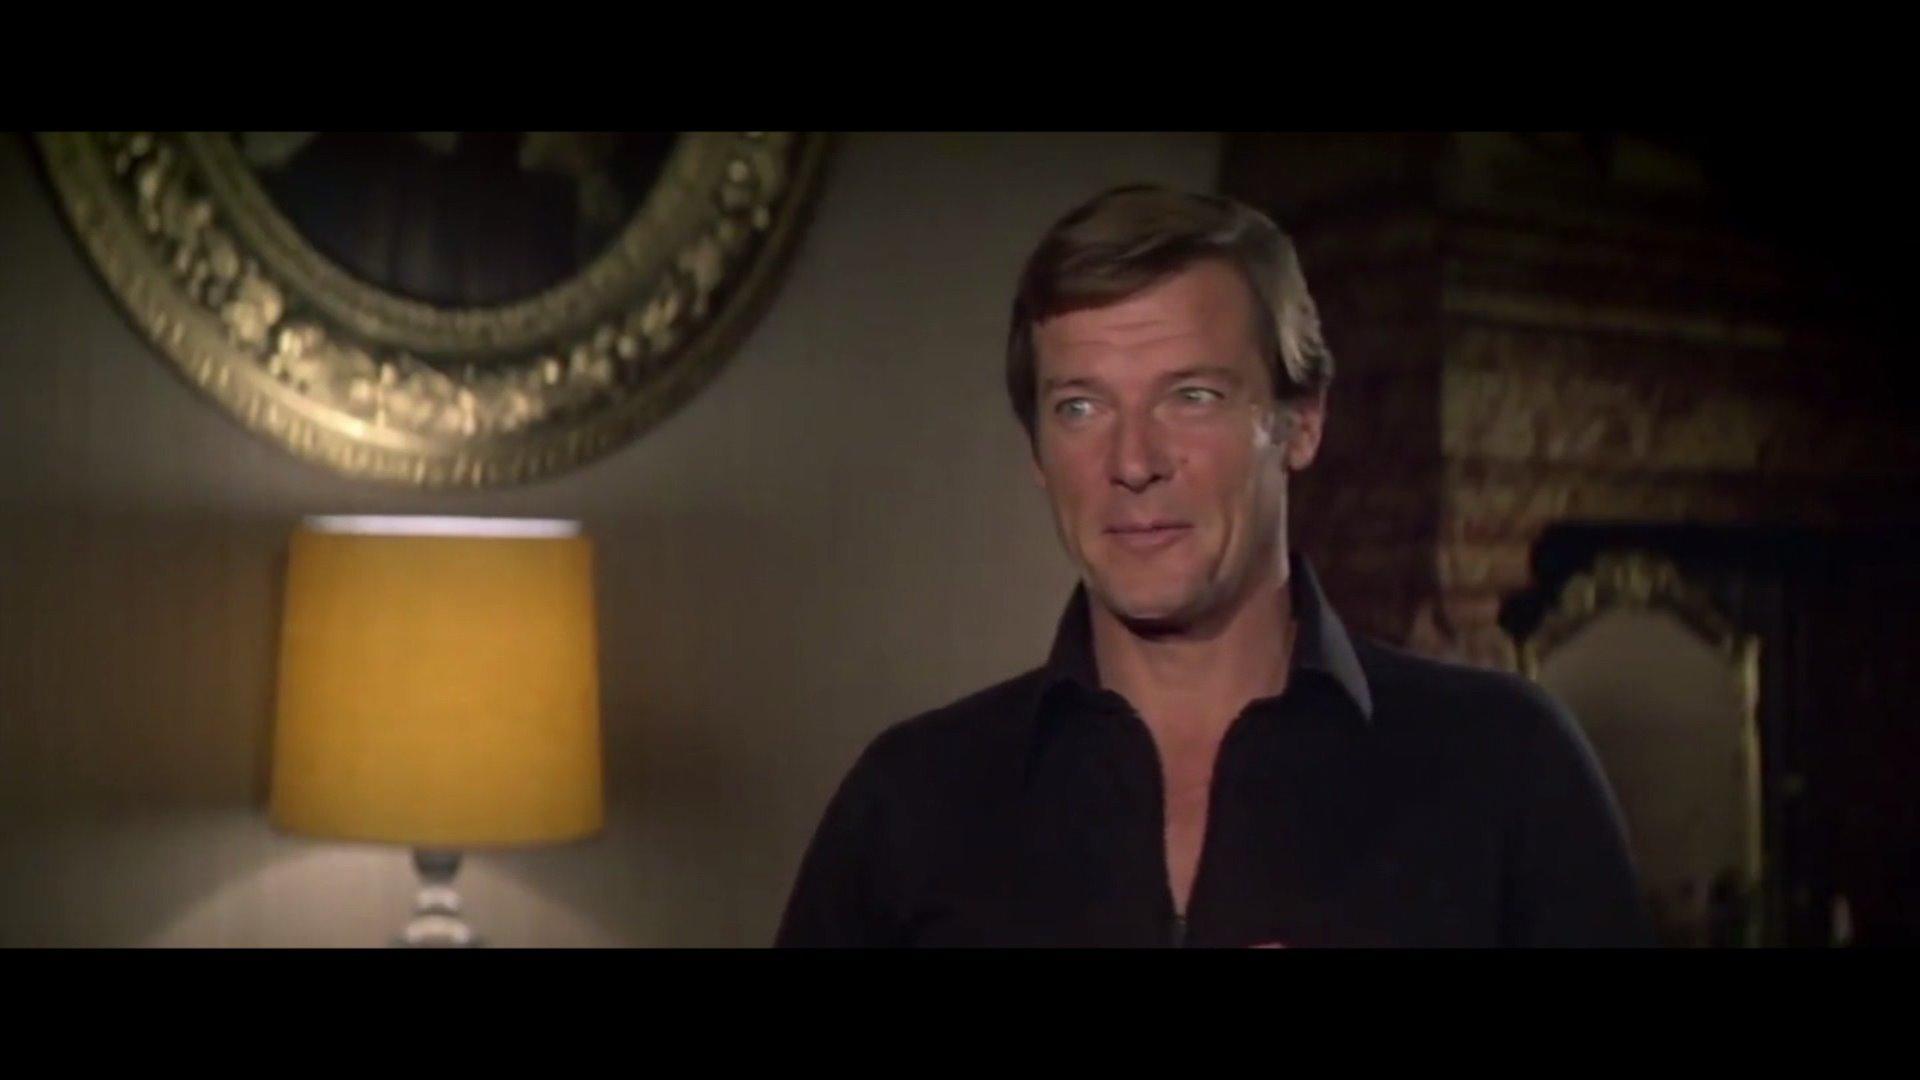 Legendary James Bond Actor Sir Roger Moore Dies at 89